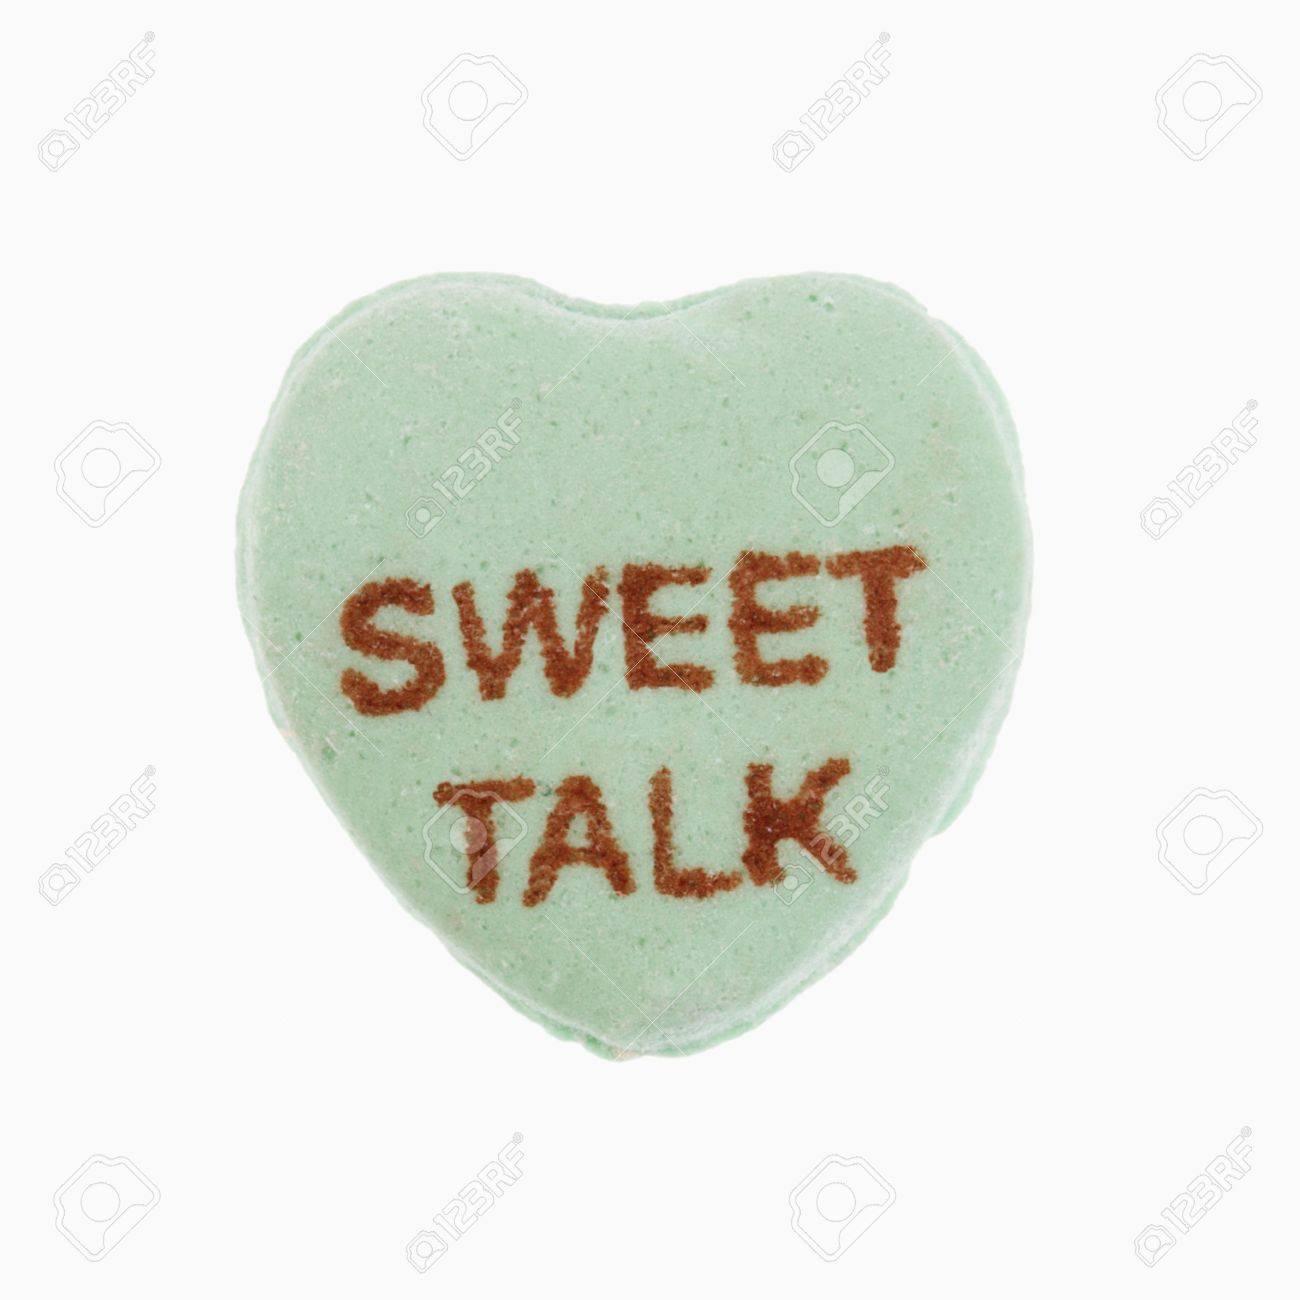 Image result for sweet talk